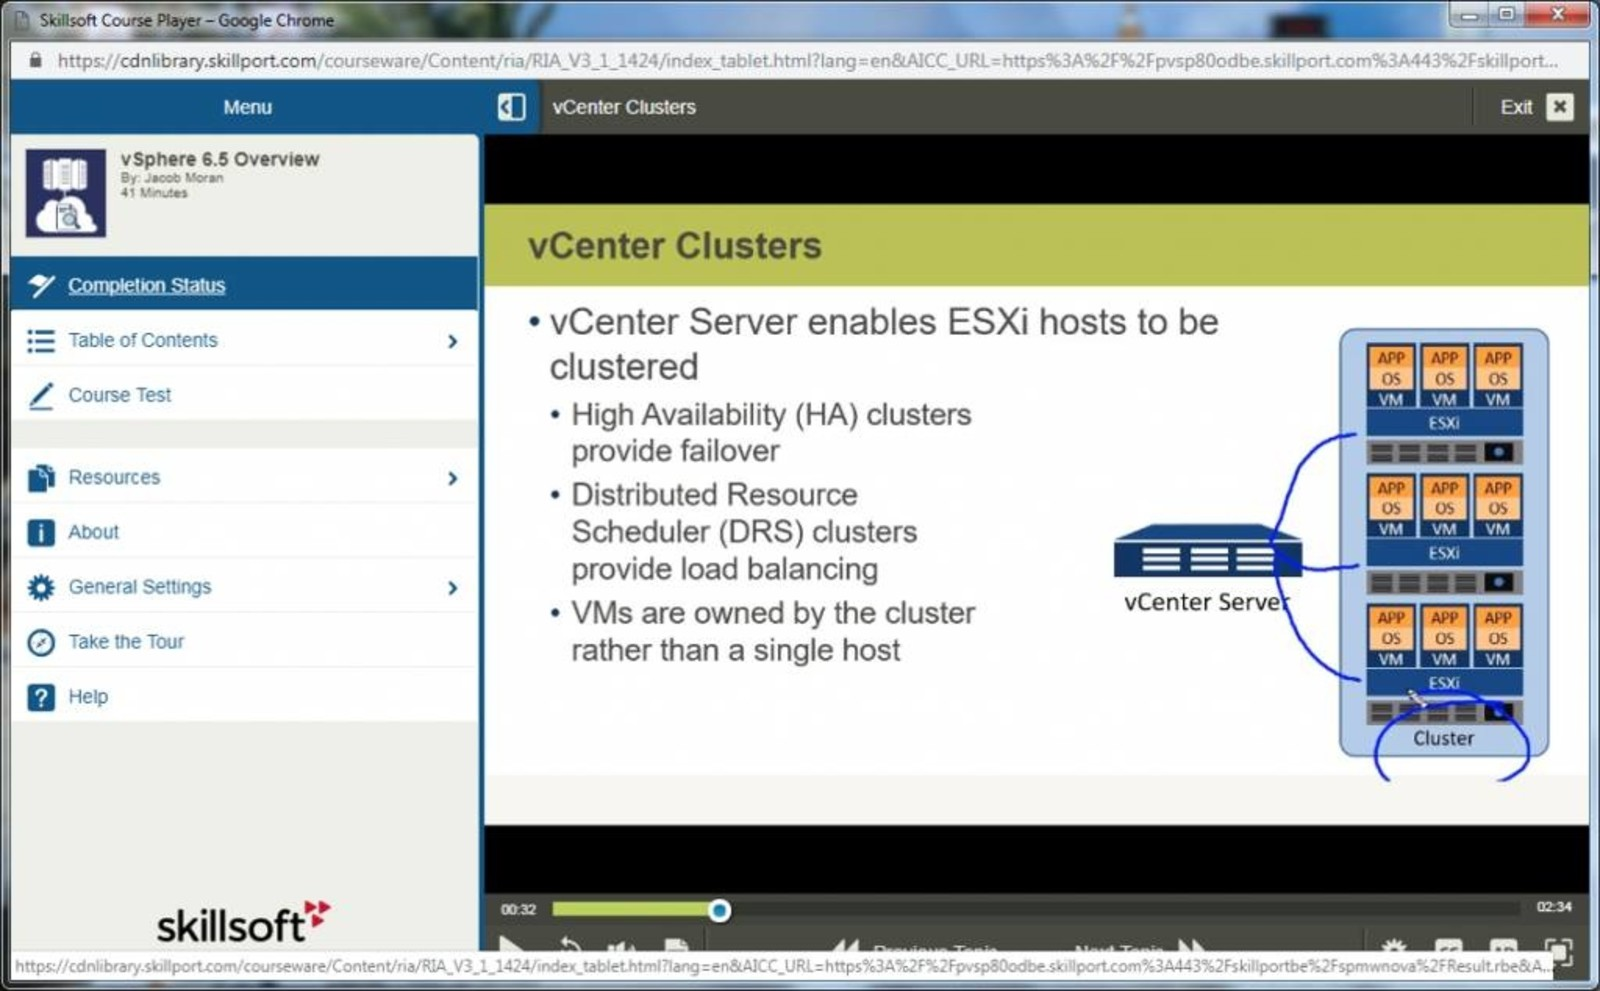 VMware VMware Certified Professional 6.5 - Data Center Virtualization (VCP6.5-DCV)OEM Certkit